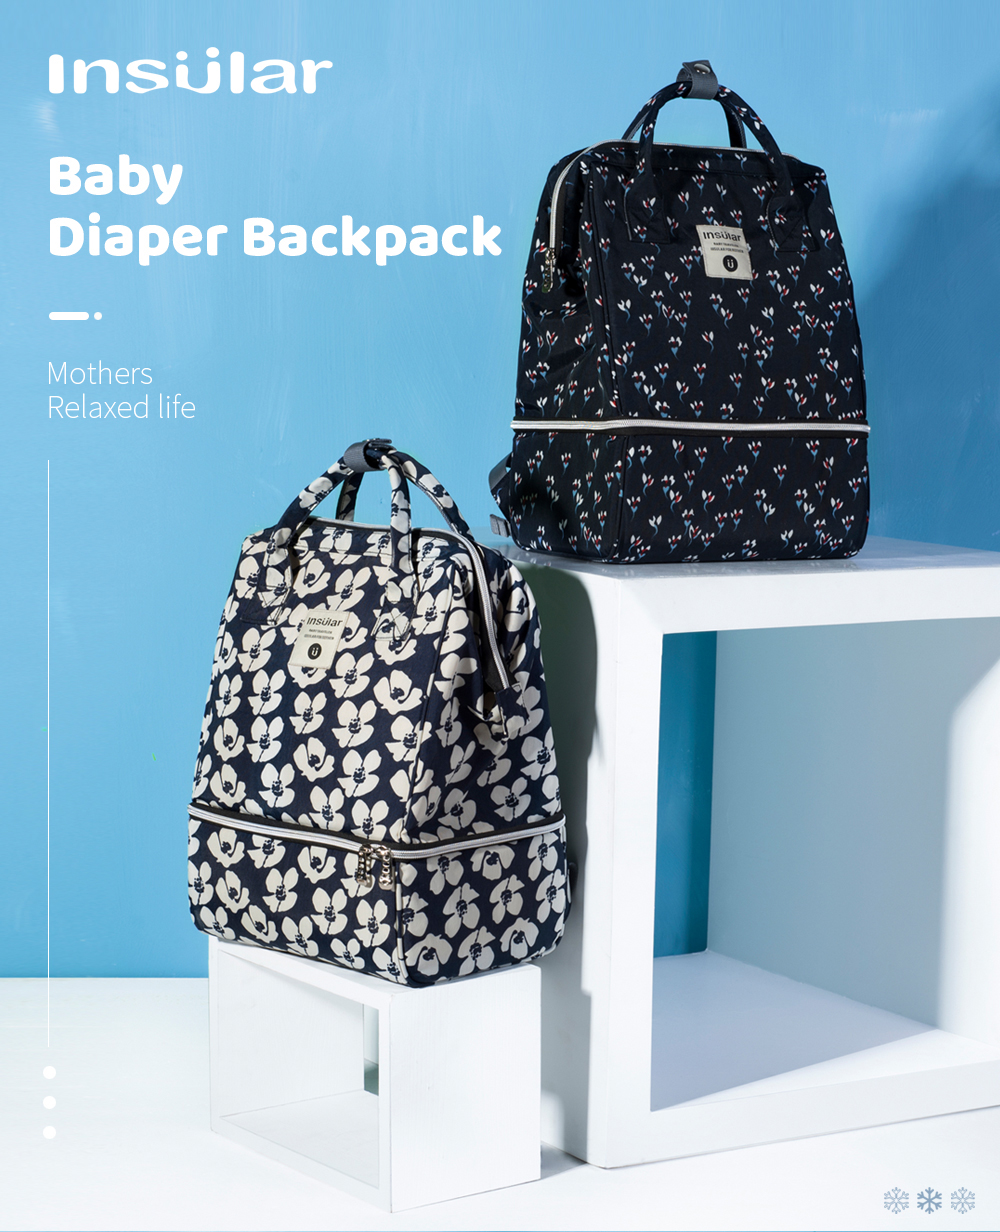 insular diaper backpack (1)